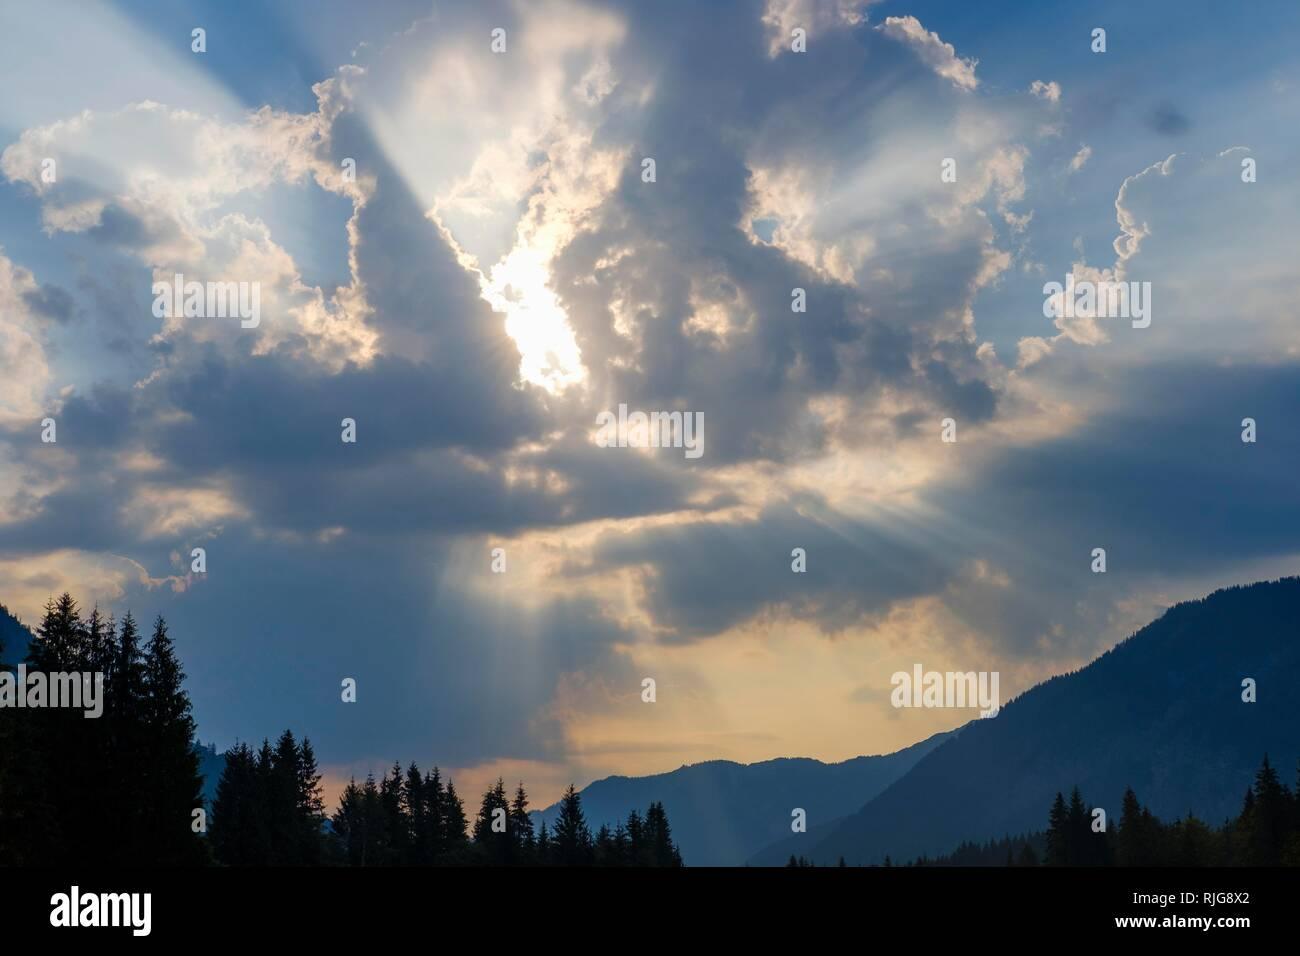 Sunrays in clouds, front crack, Lenggries, Isarwinkel, Upper Bavaria, Bavaria, Germany - Stock Image